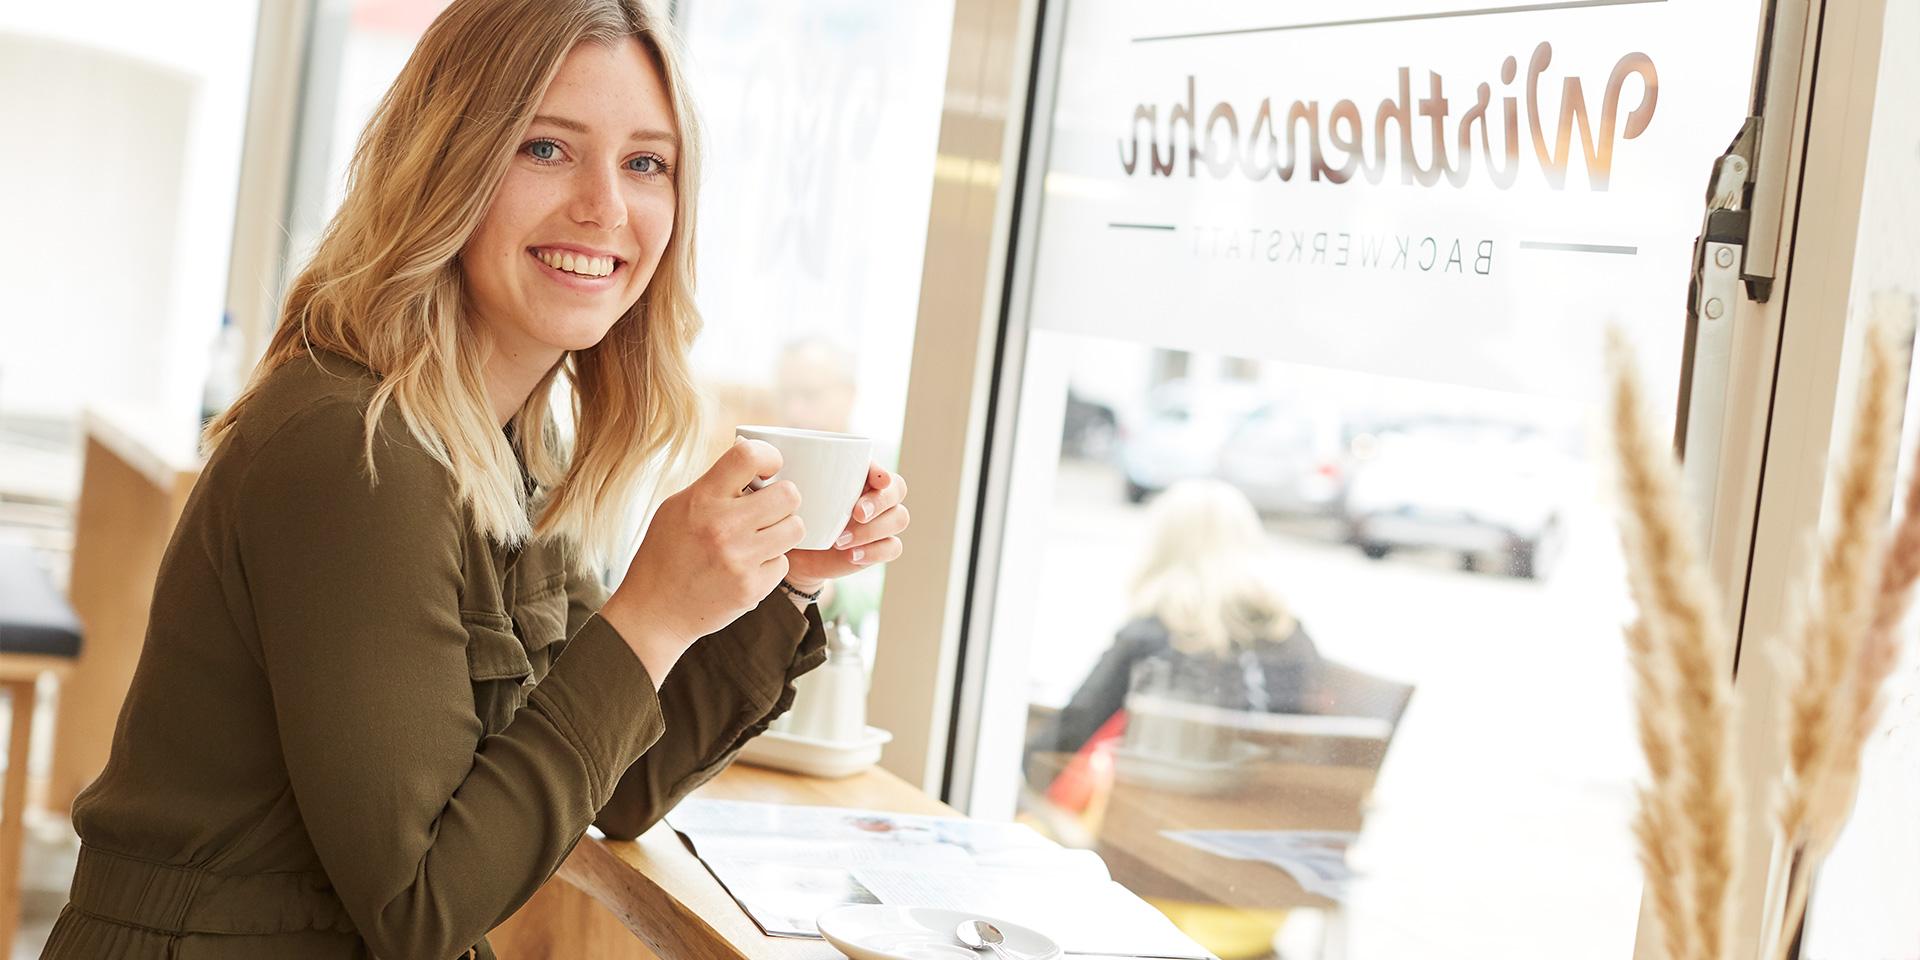 Kaffeegenuß in Wirthensohn's Bäckerei